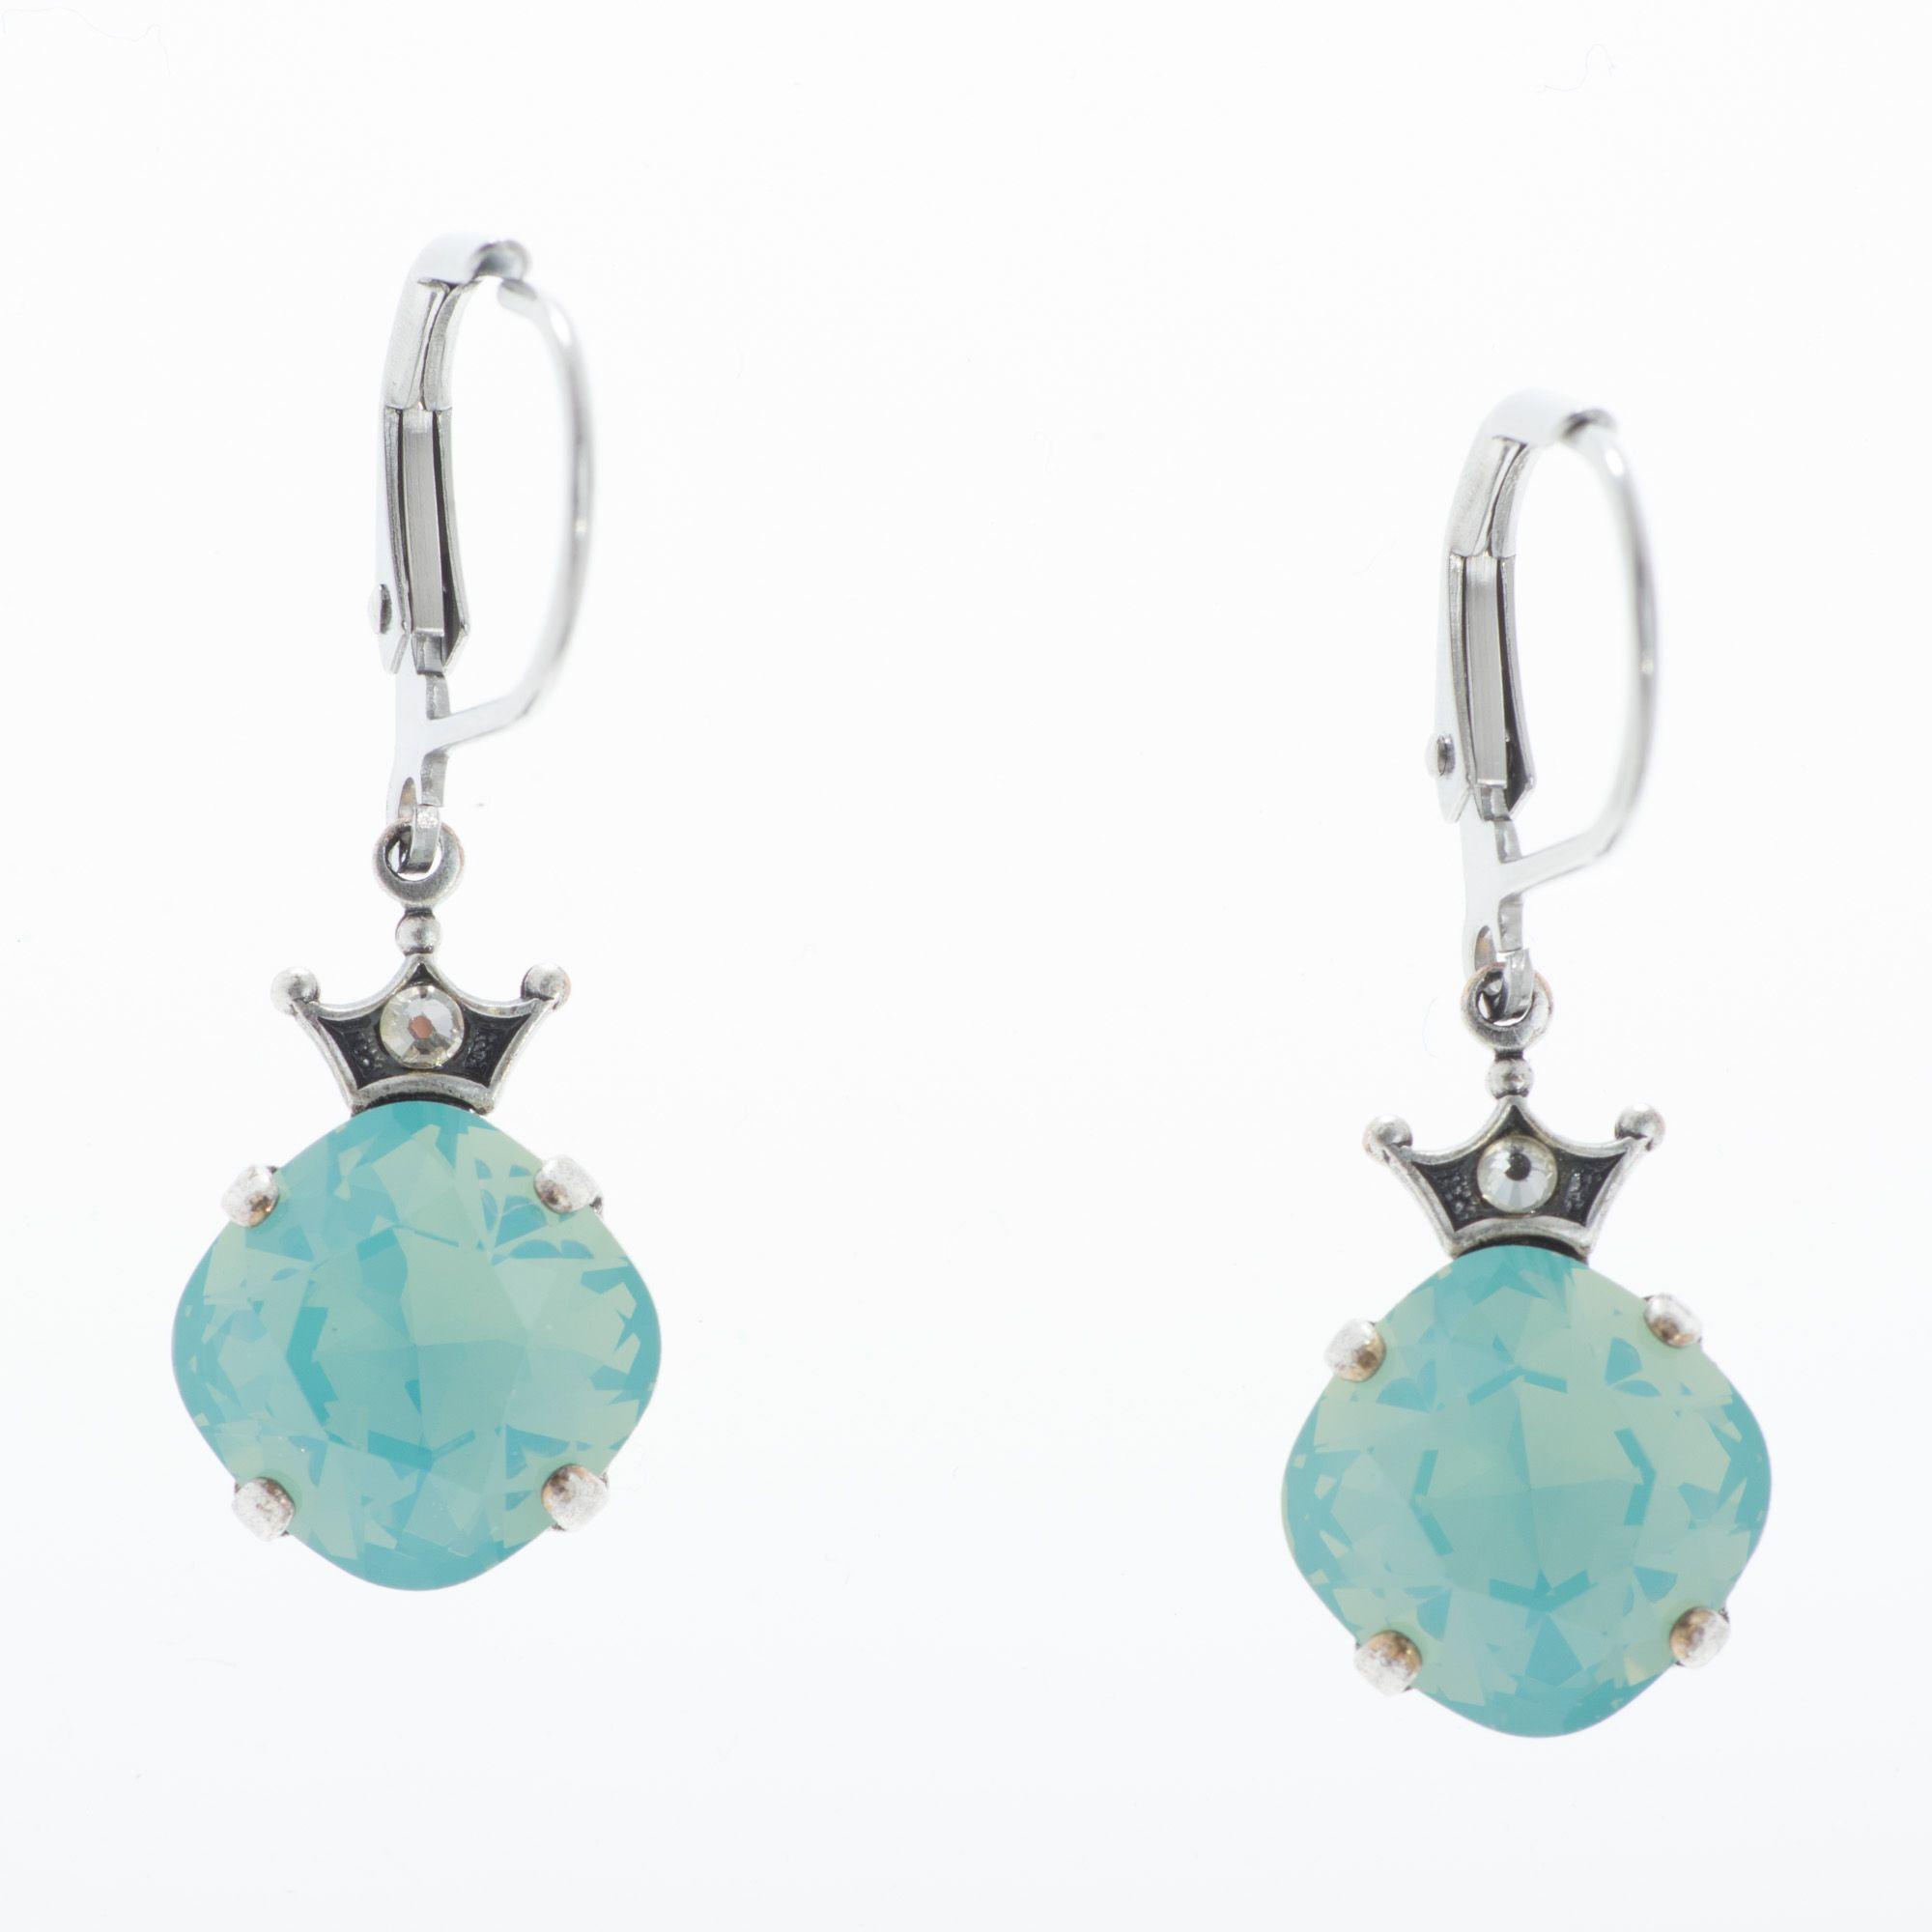 3ff61a33a50b5 Square Swarovski Earrings - Best All Earring Photos Kamilmaciol.Com